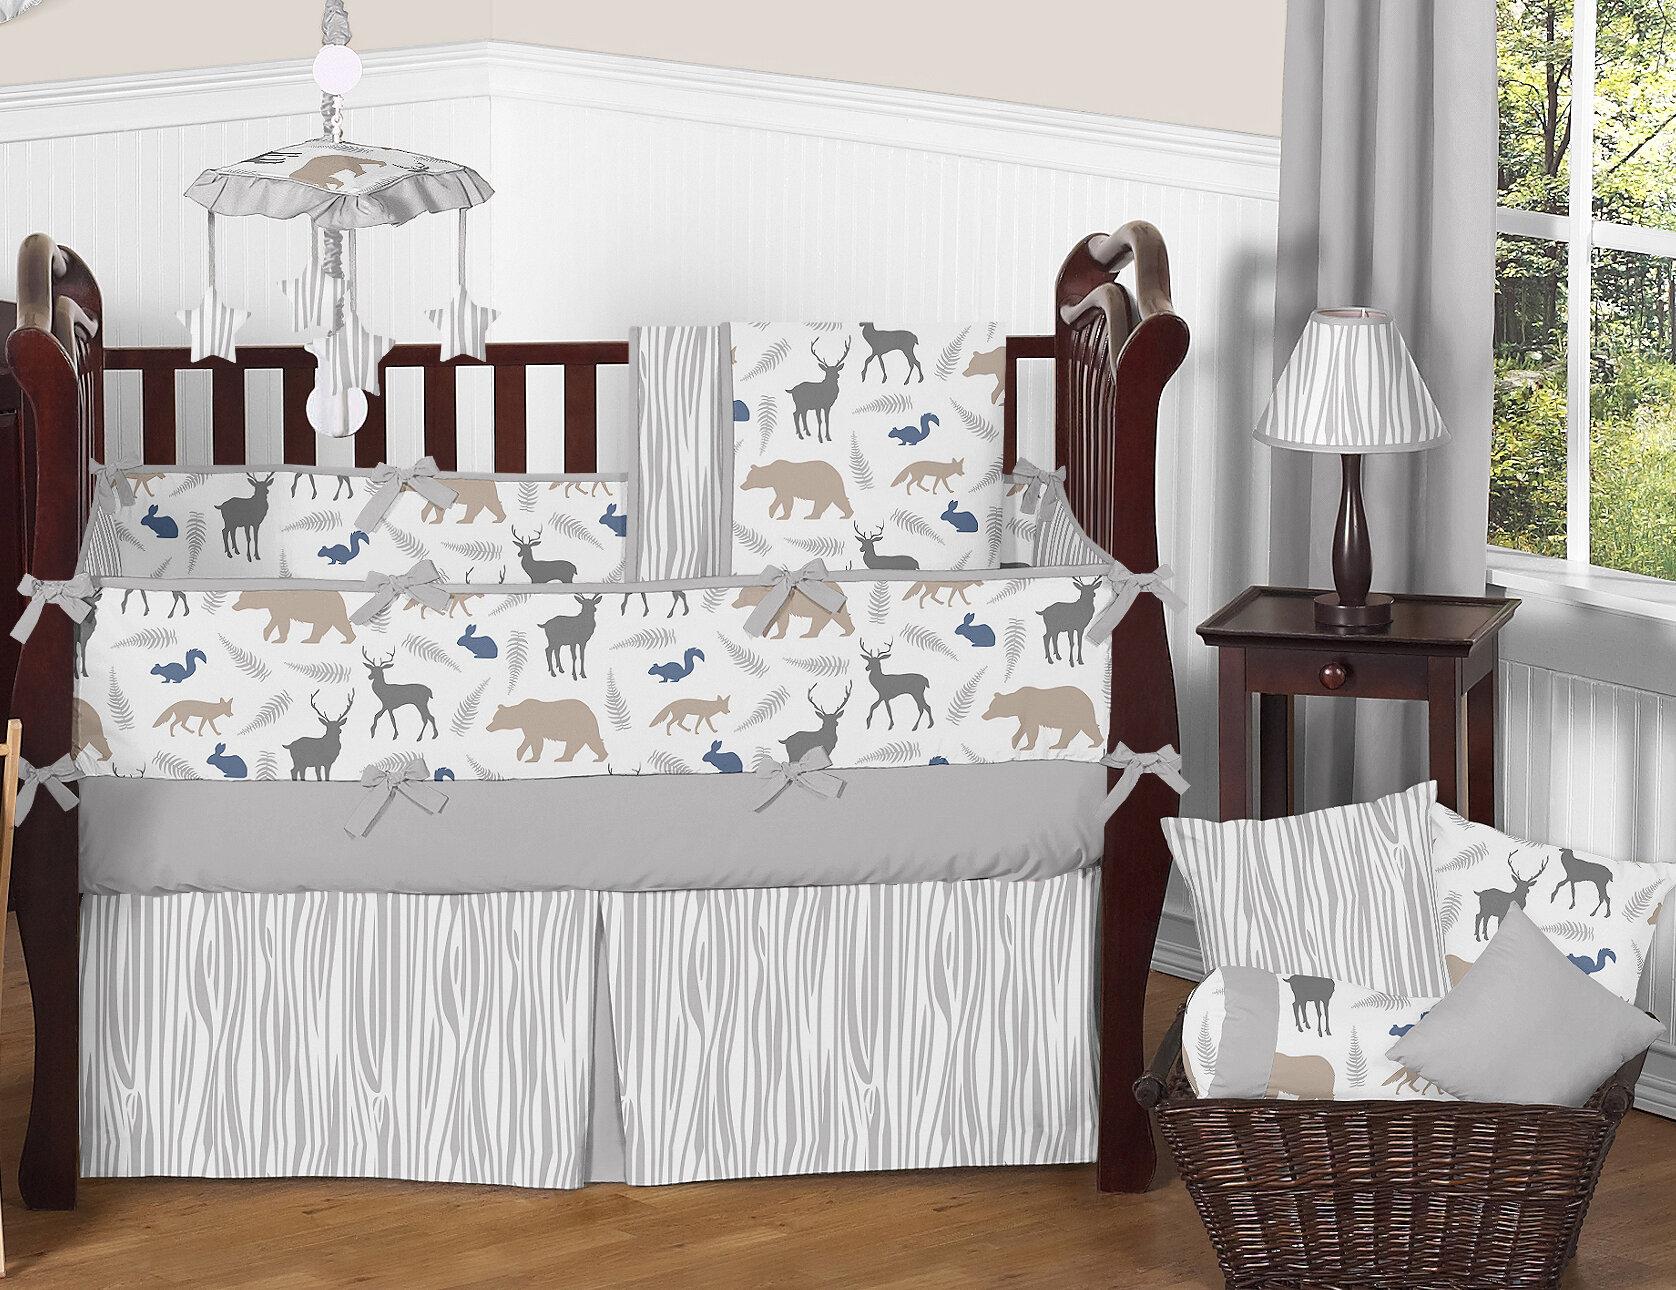 Sweet Jojo Designs Woodland Animals 9 Piece Crib Bedding Set